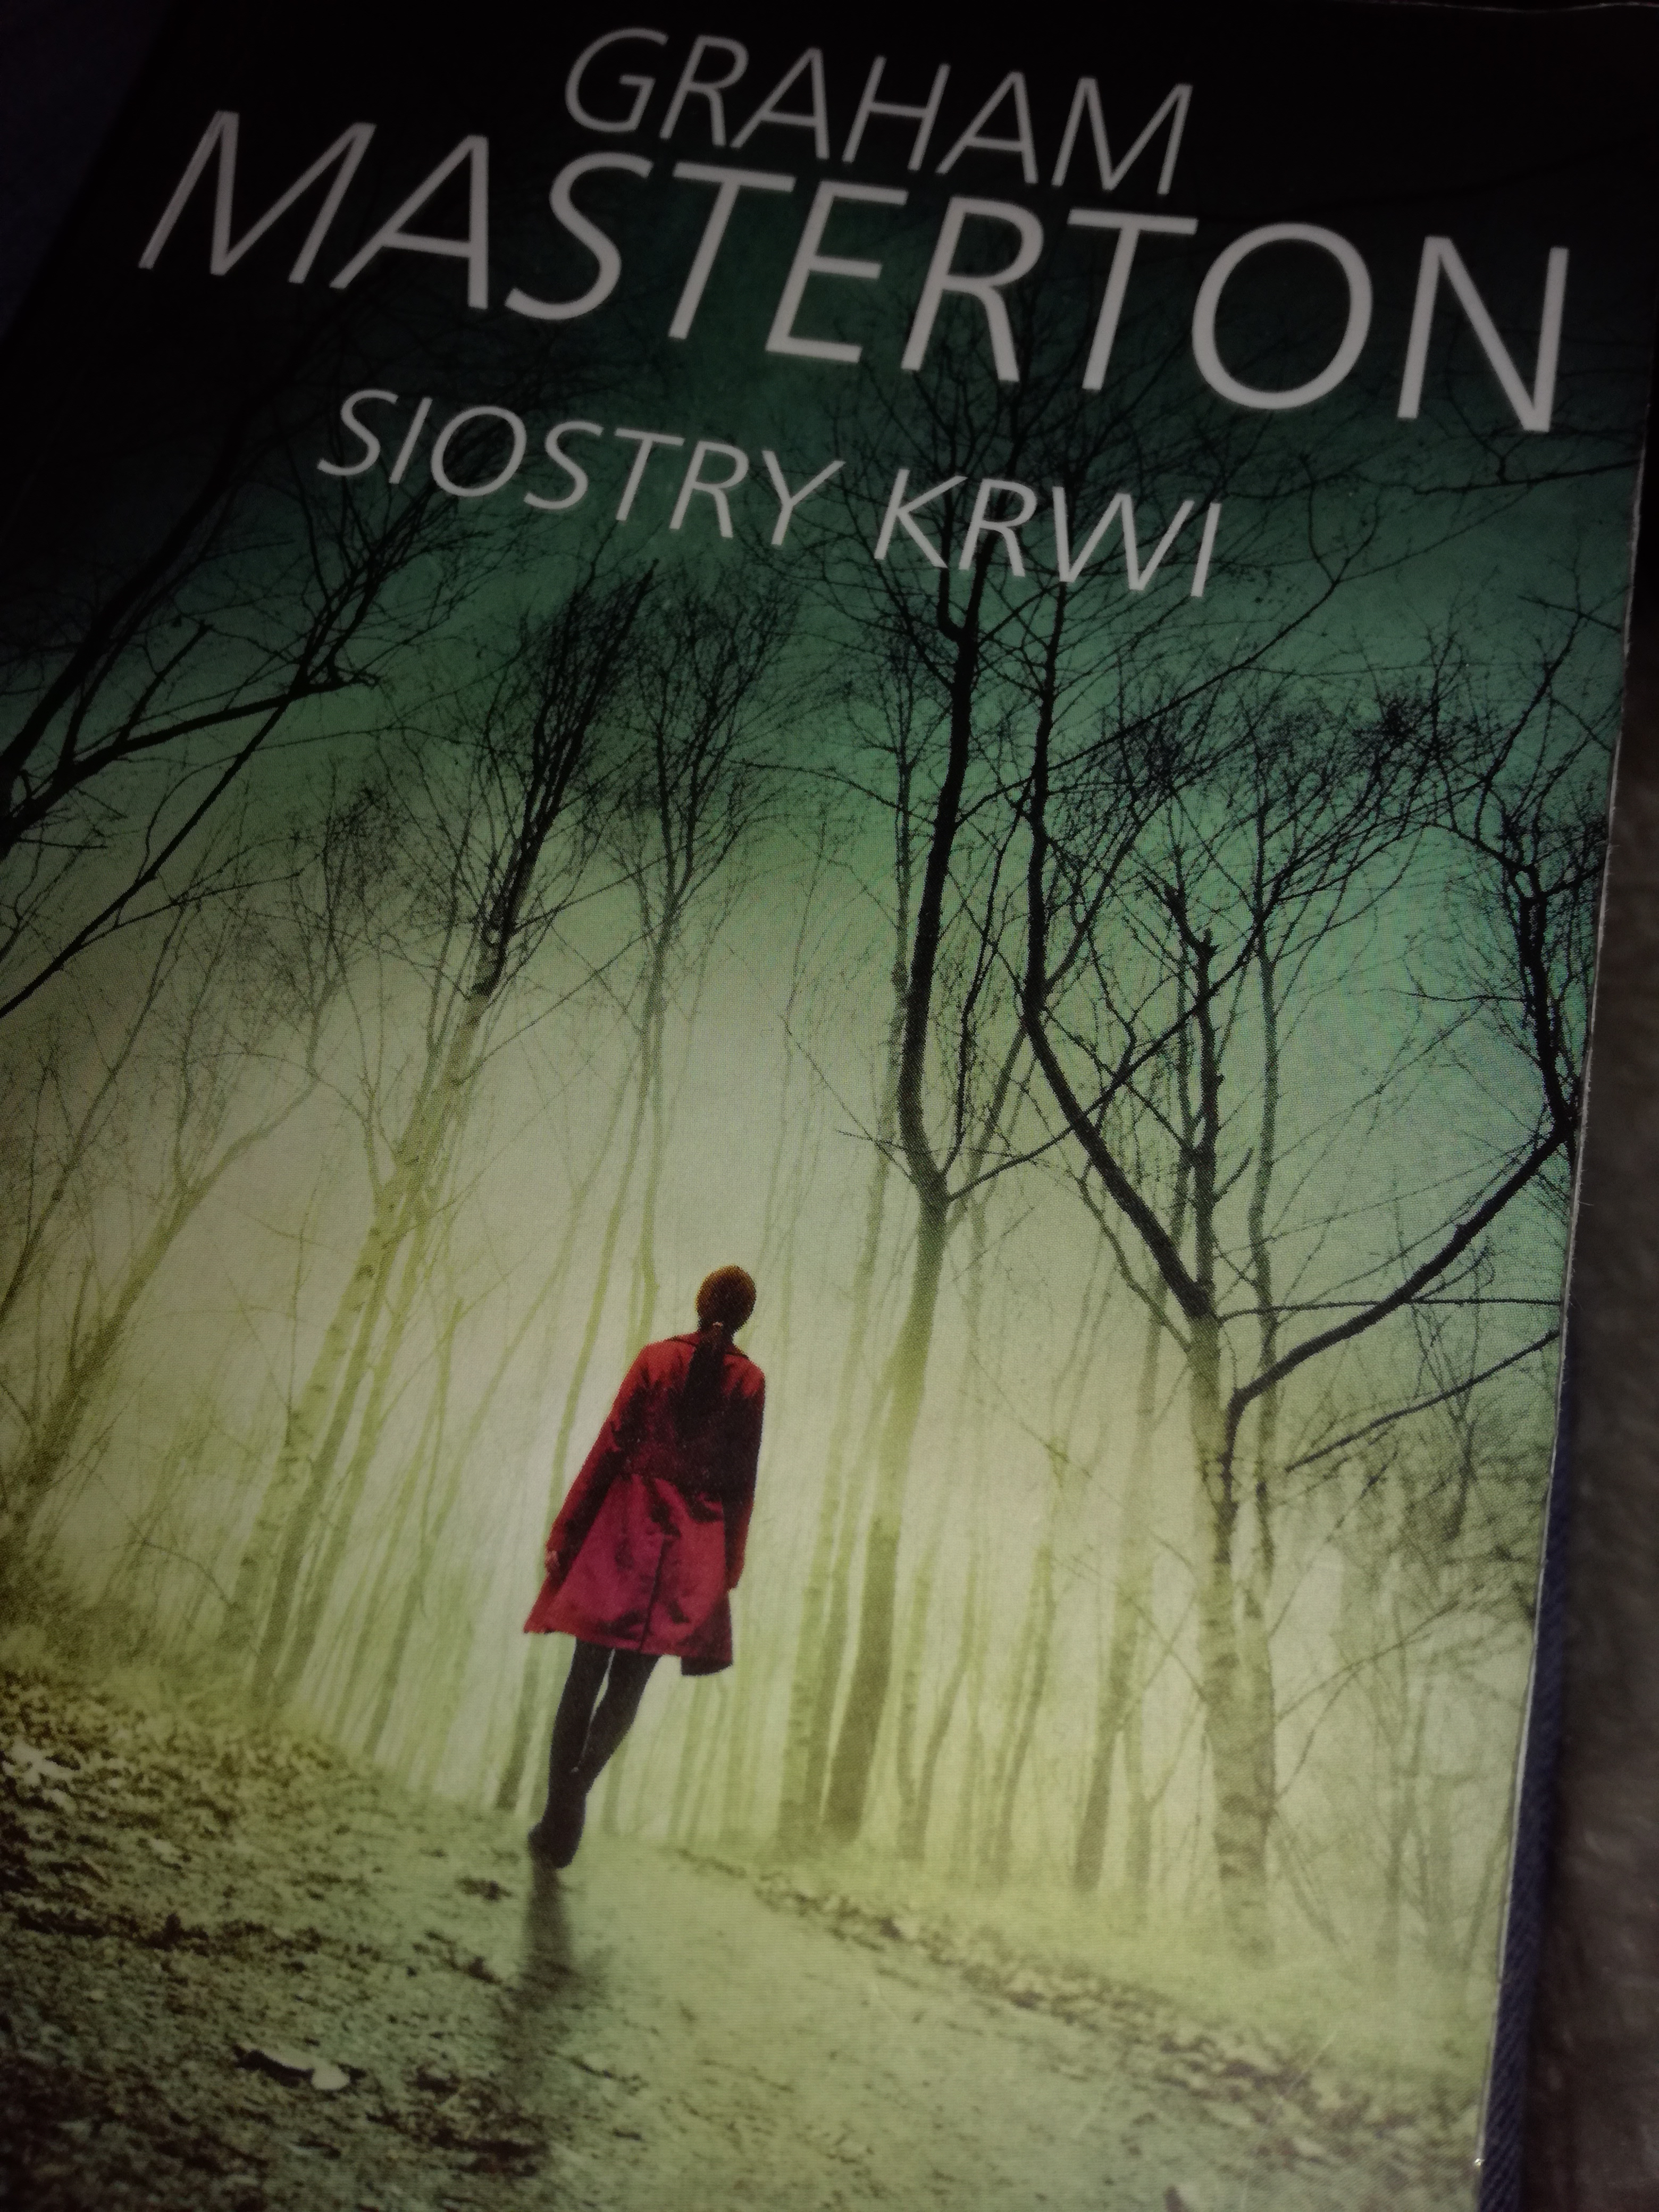 Siostry krwi – Graham Masterton